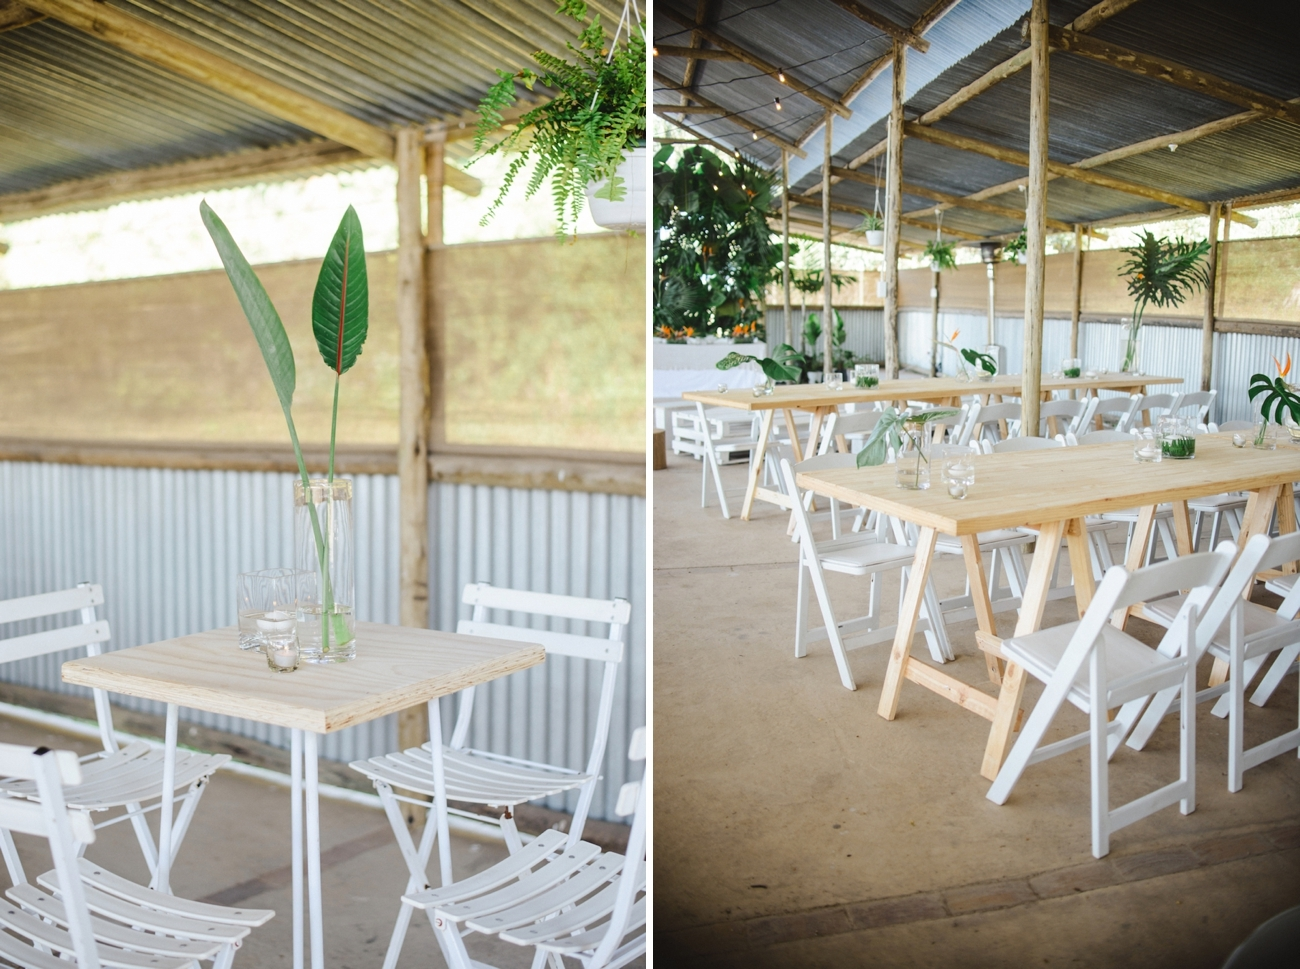 Durban North Coast Tropical Chic Wedding Decor | Credit: Oh Happy Day & Dane Peterson